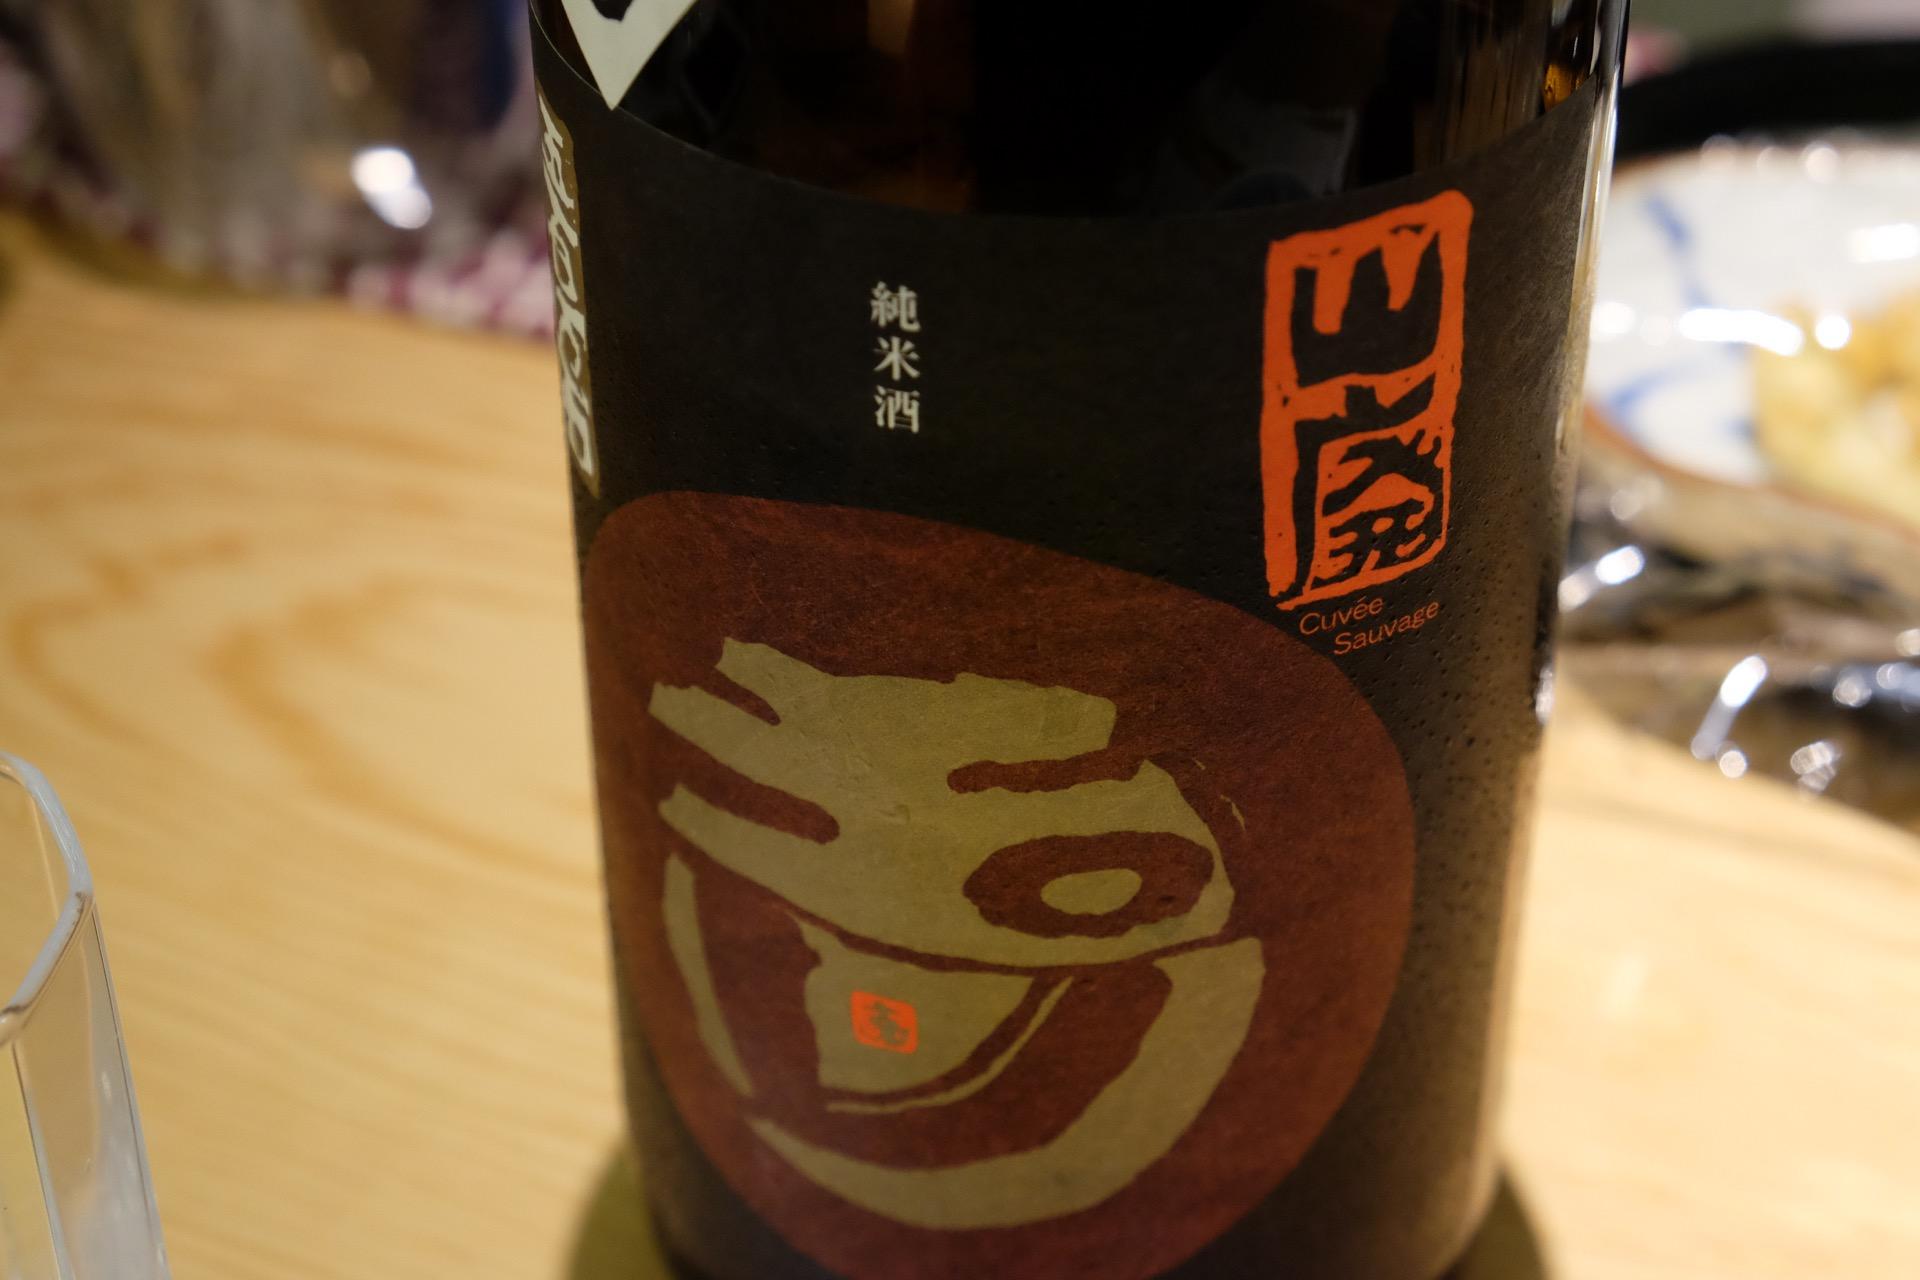 玉川 自然仕込 純米酒(山廃)五百万石 無濾過生原酒|日本酒テイスティングノート